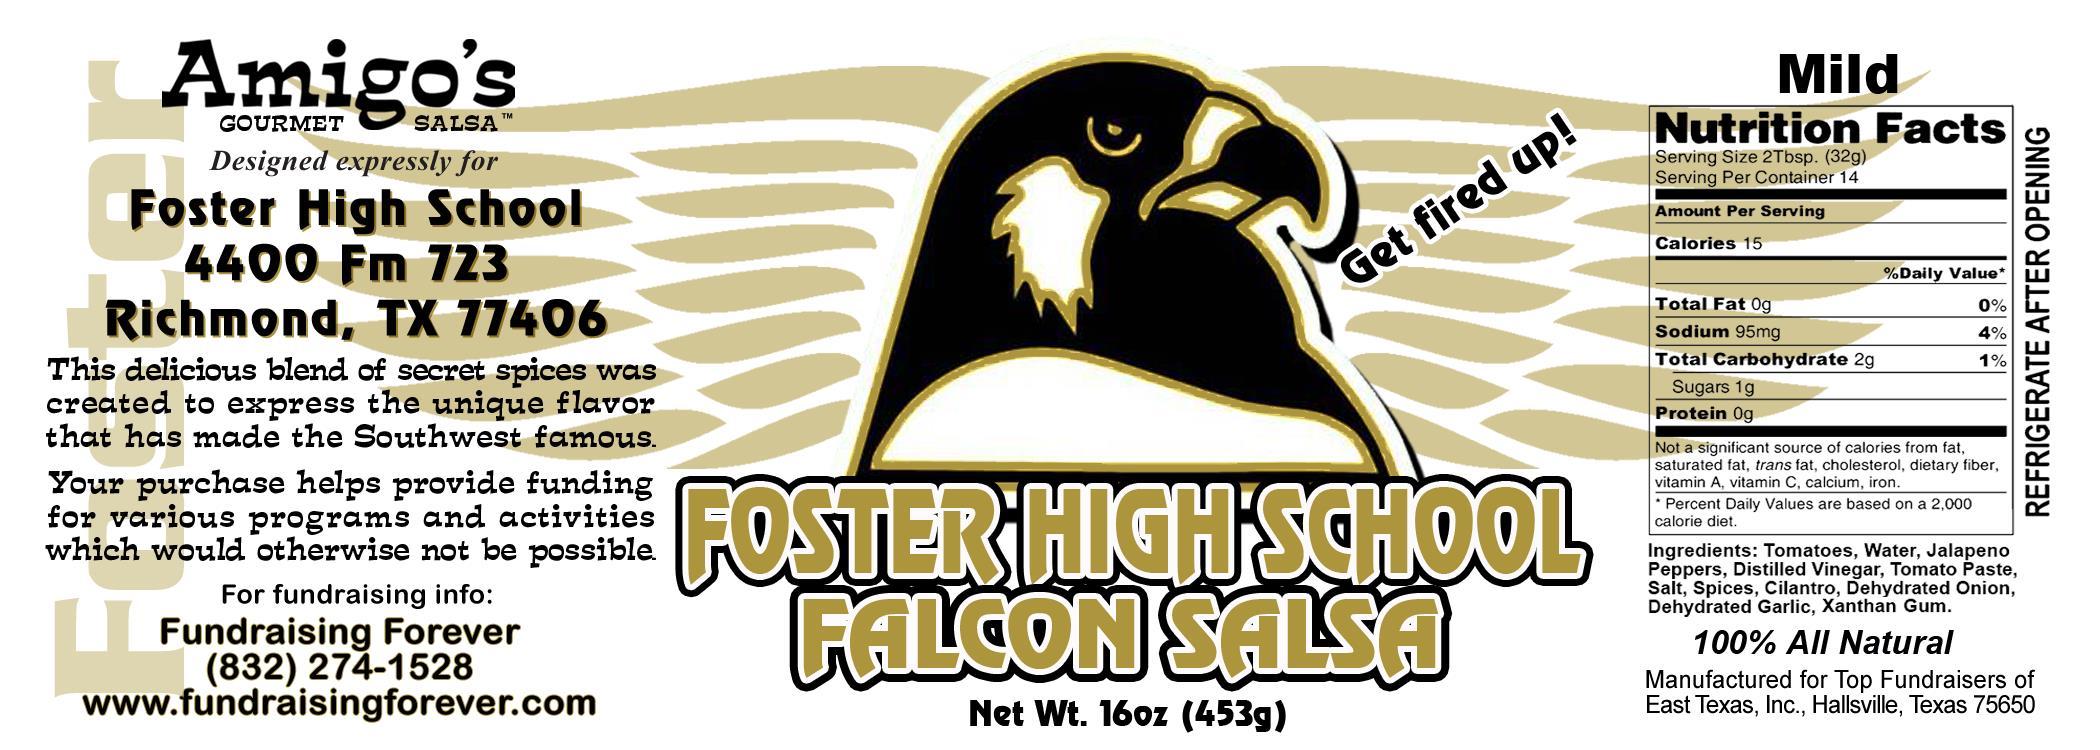 01 Foster High School Falcons Jar MILD.jpg